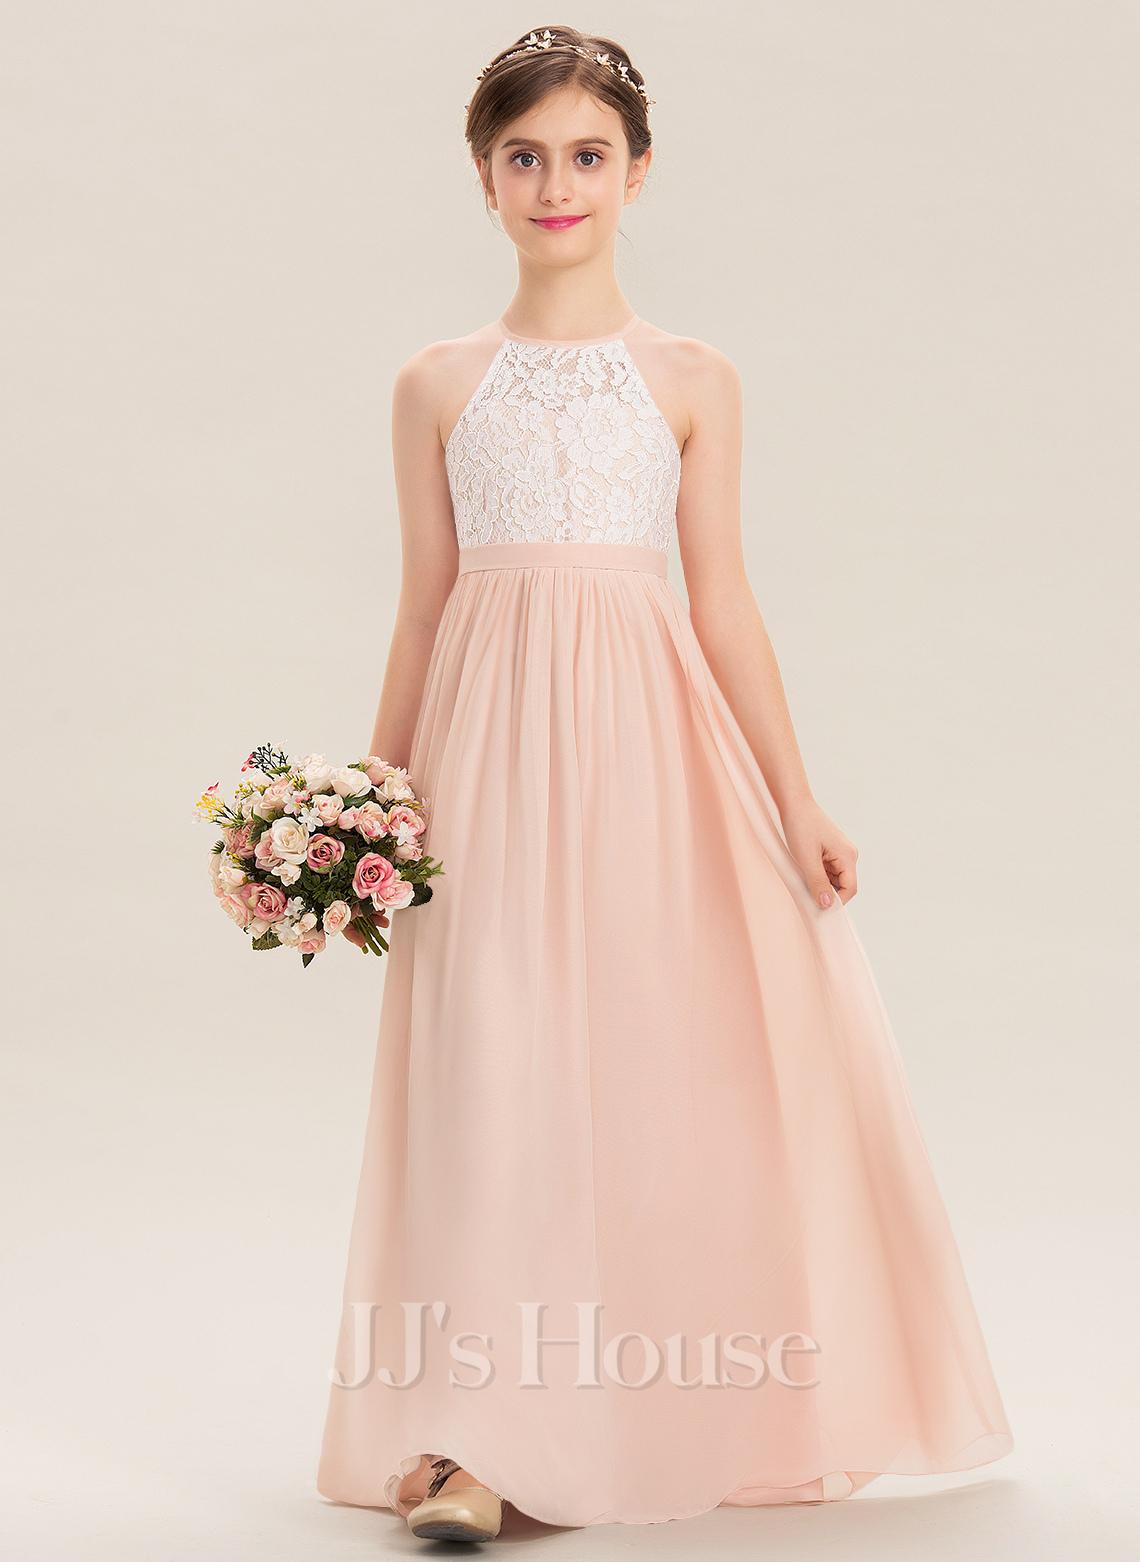 A-Line Scoop Neck Floor-Length Chiffon Lace Junior Bridesmaid Dress